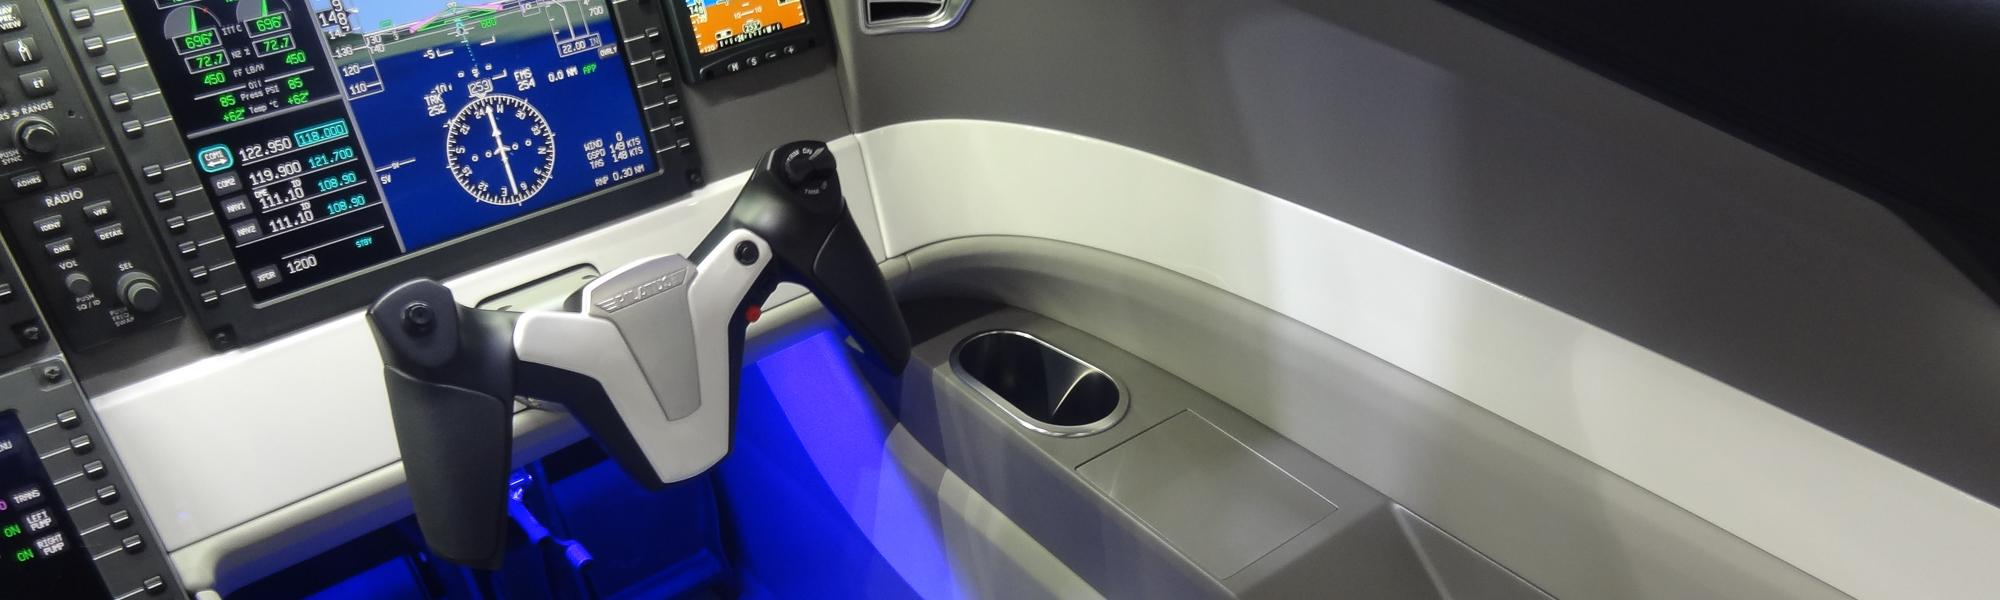 Carbon Luftfahrt Kunststoff.jpg